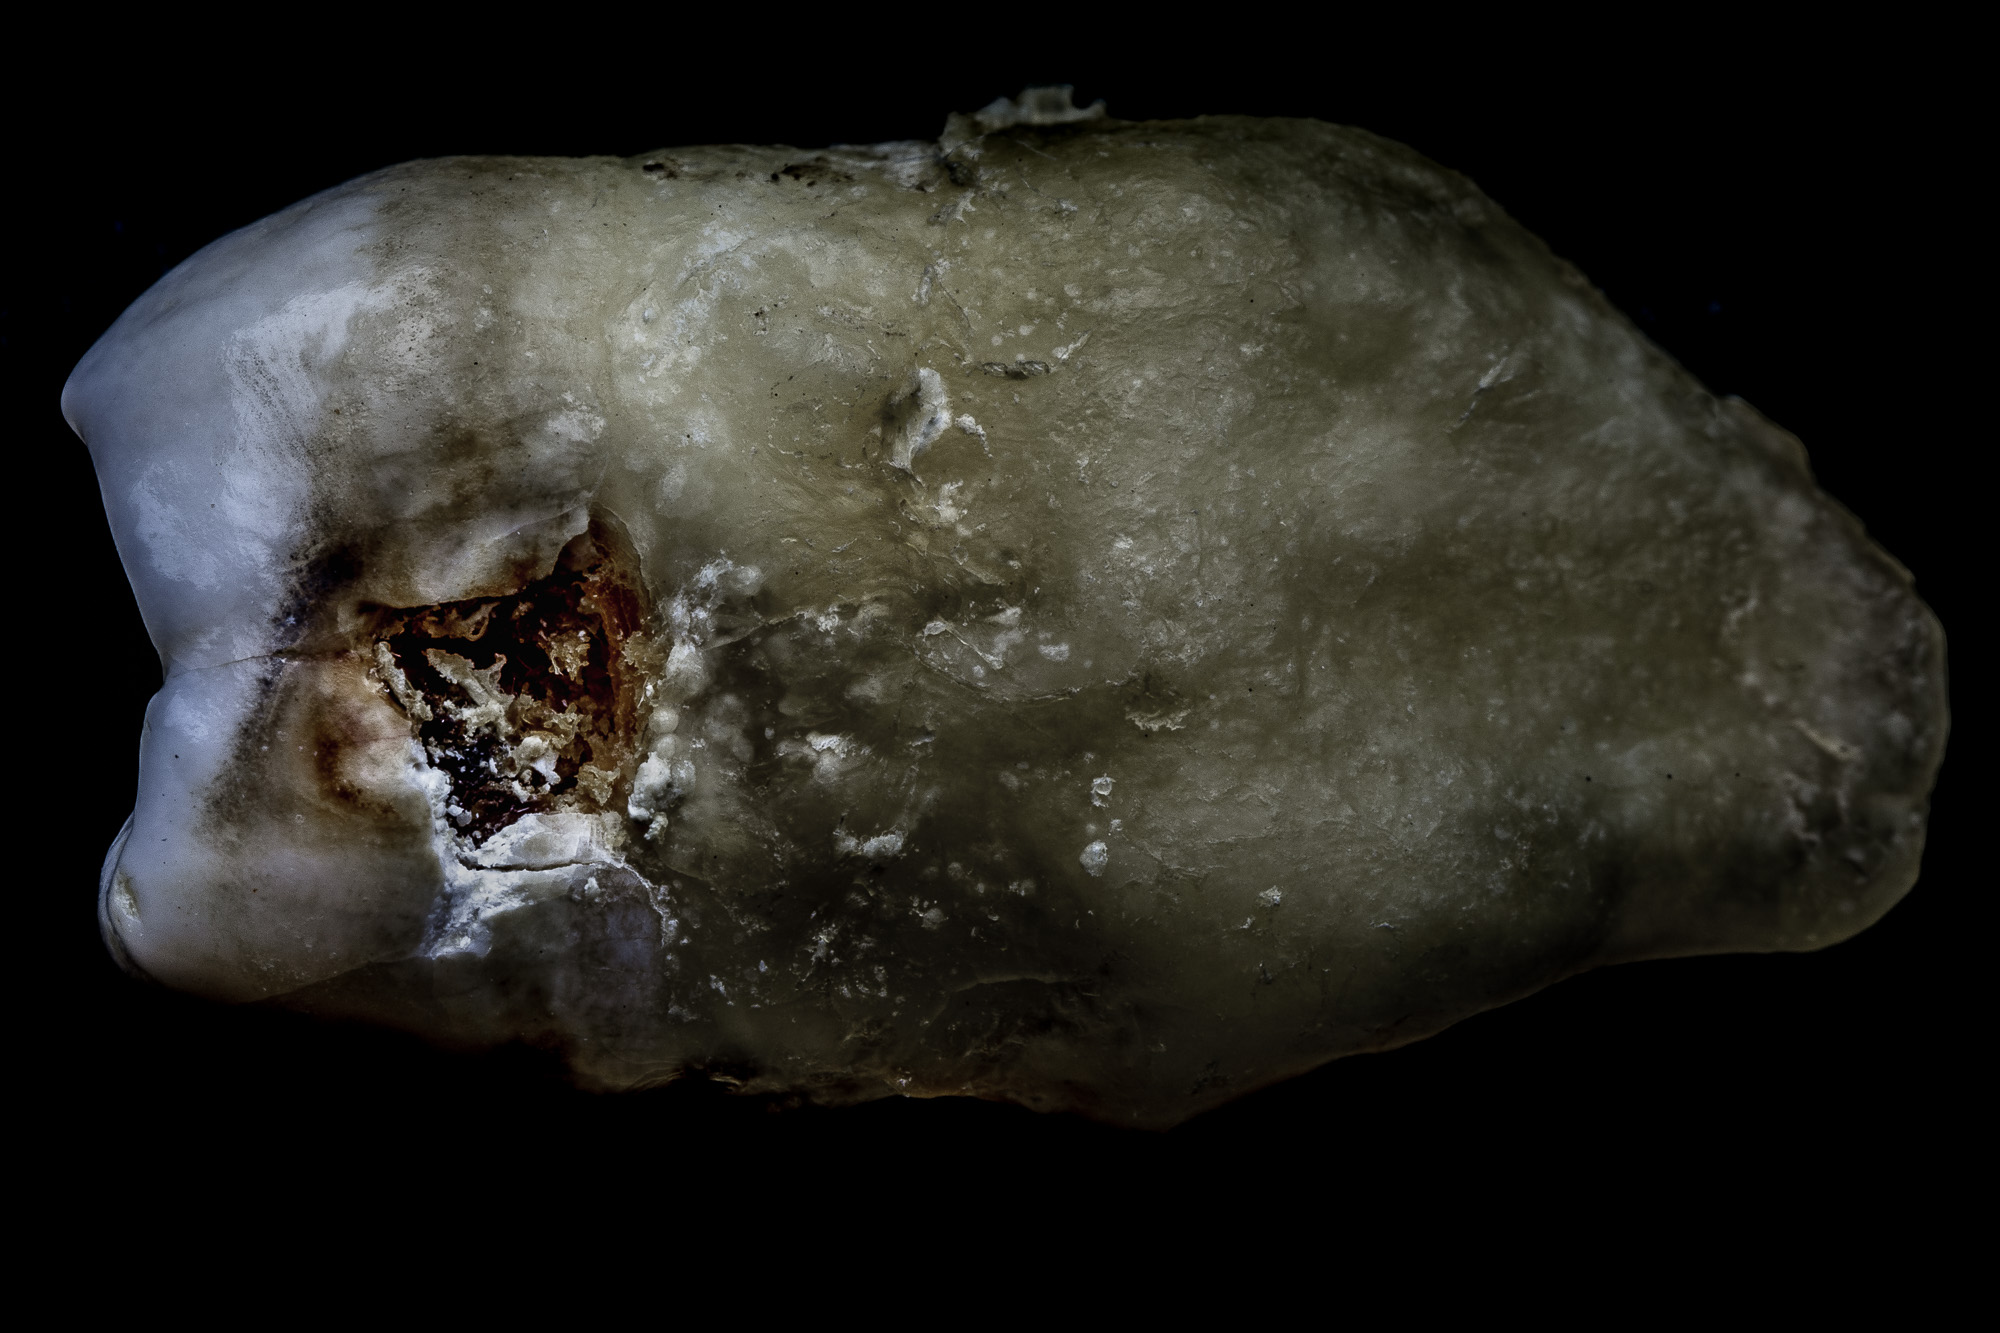 neal-auch-human-teeth-photographs-1.jpg